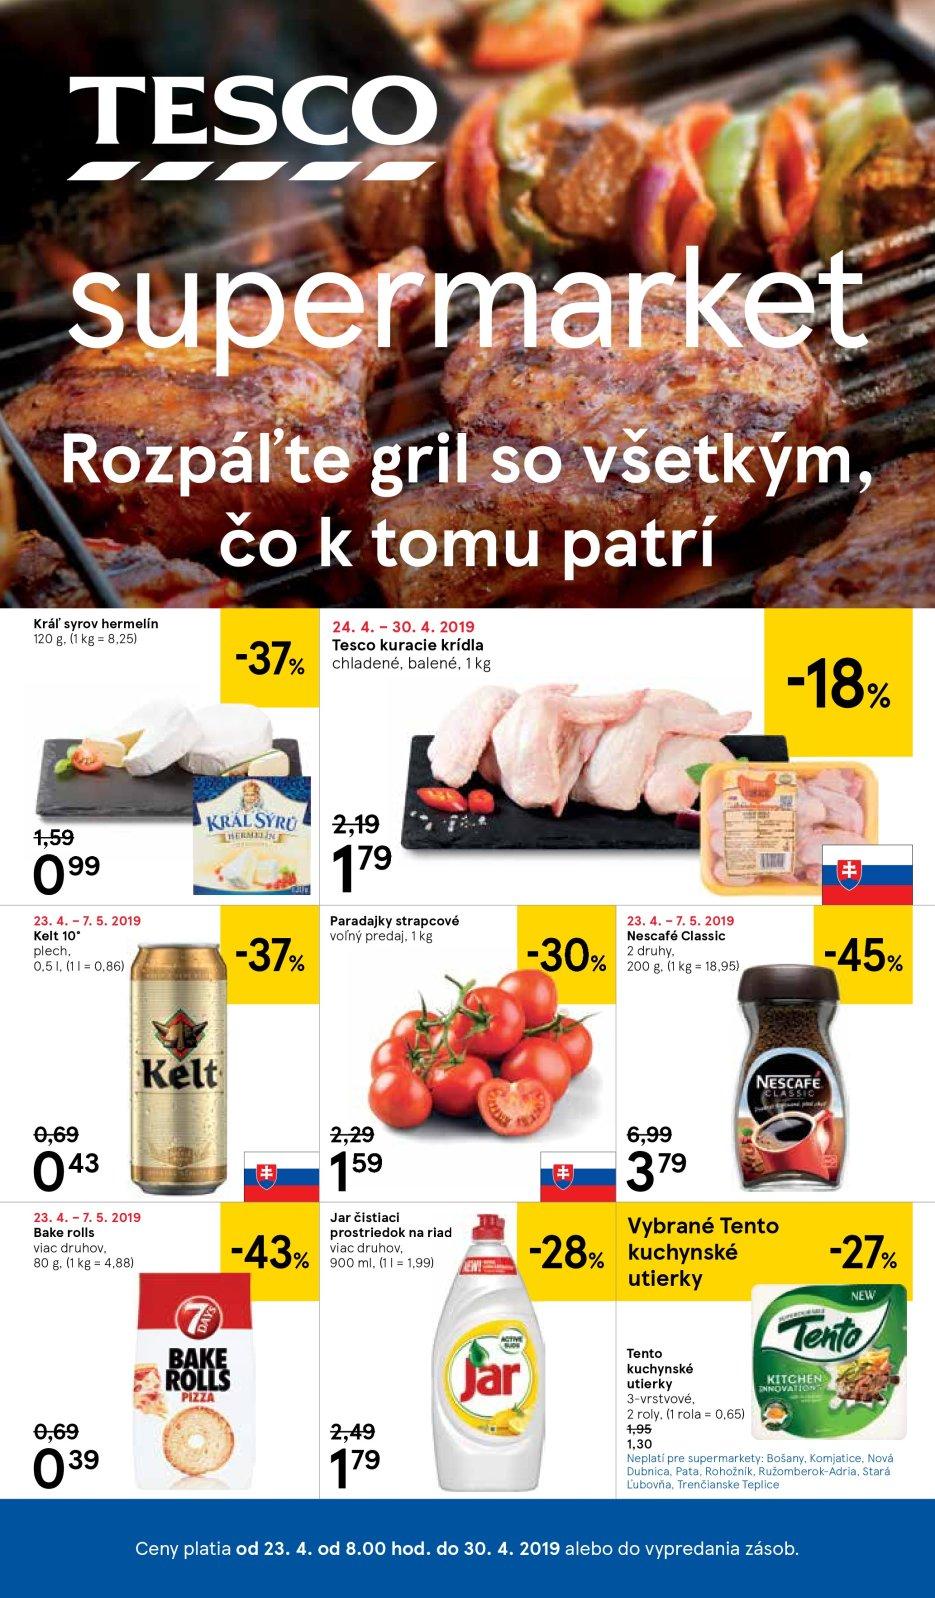 e3c098d62 Supermarket Žilina Tempo Leták 16 | Letak strany | Tesco